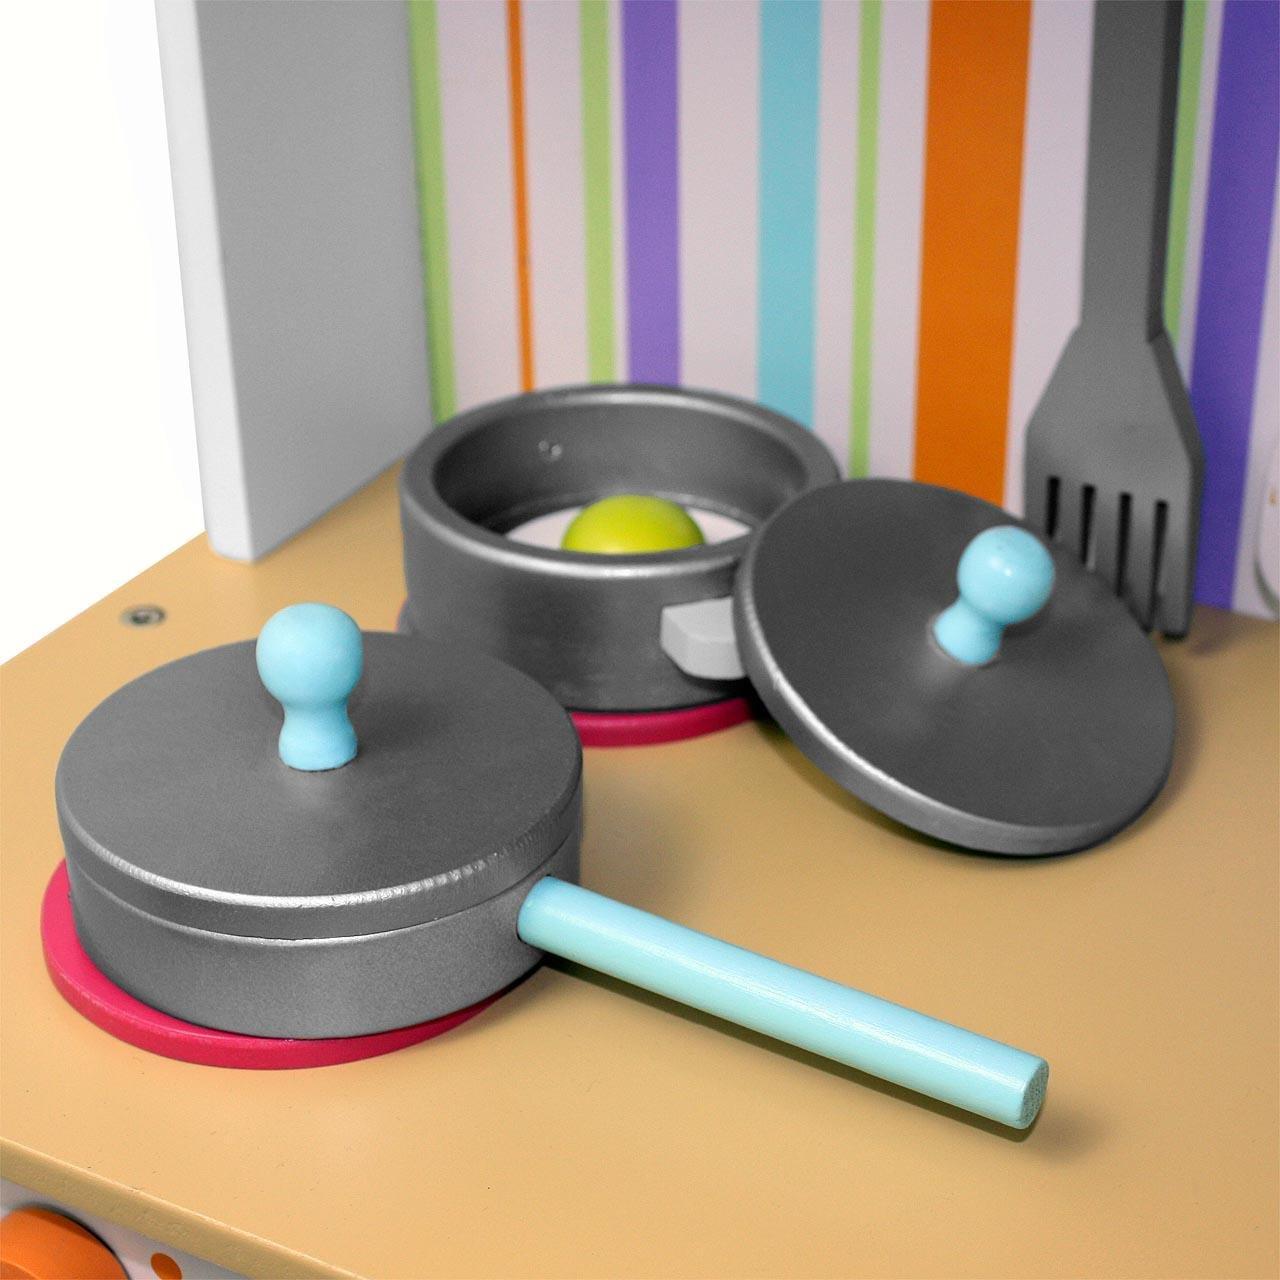 Froggy® Kinderküche Spielküche BTK01 Aus Holz: Amazon.de: Baby